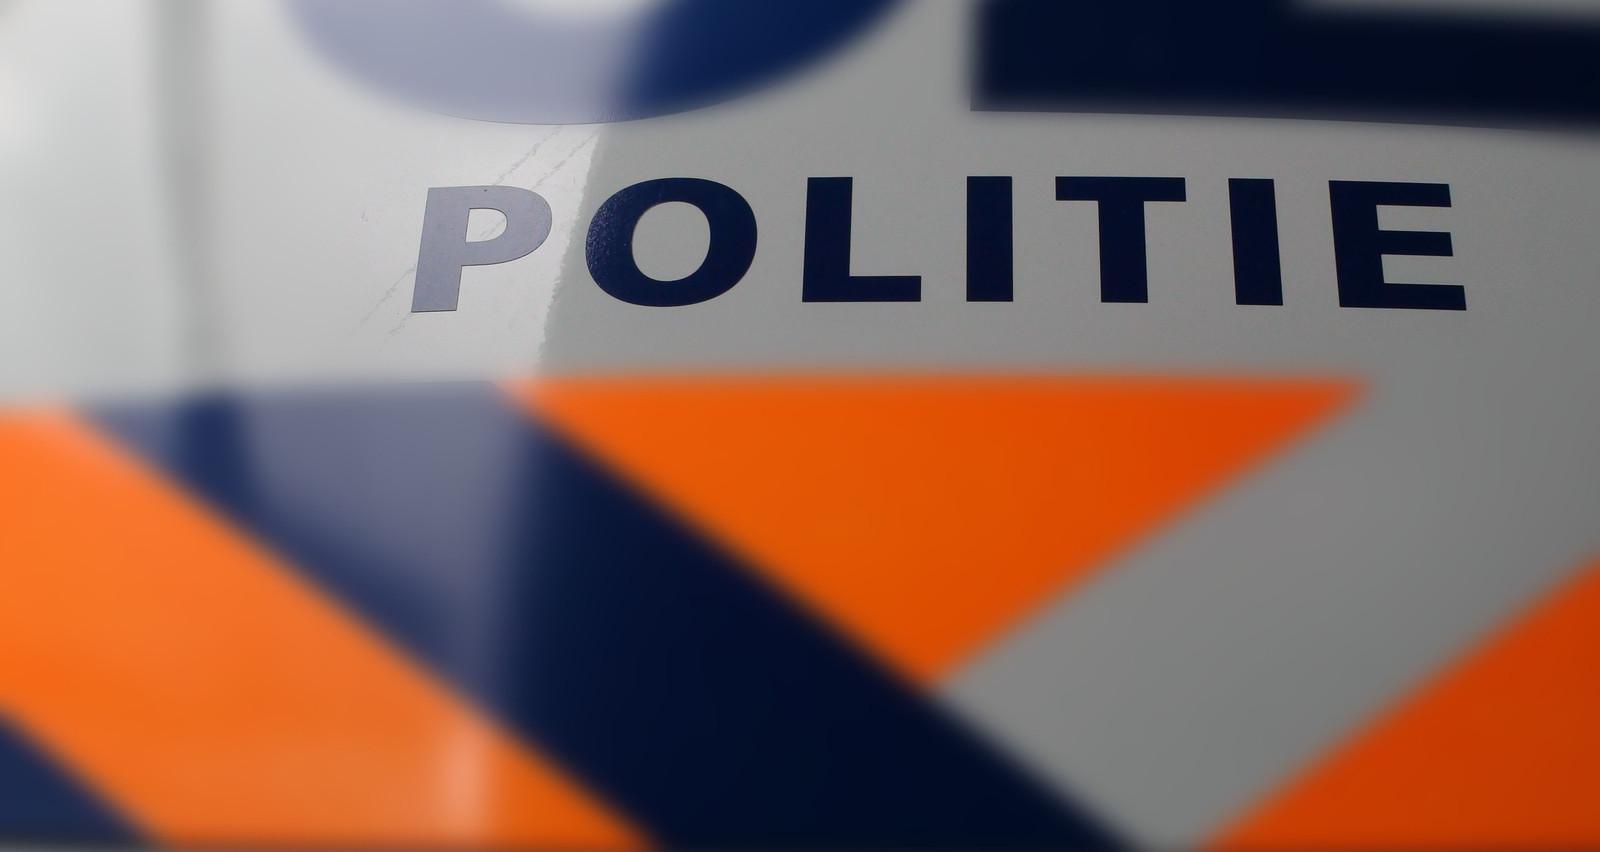 stockadr politie